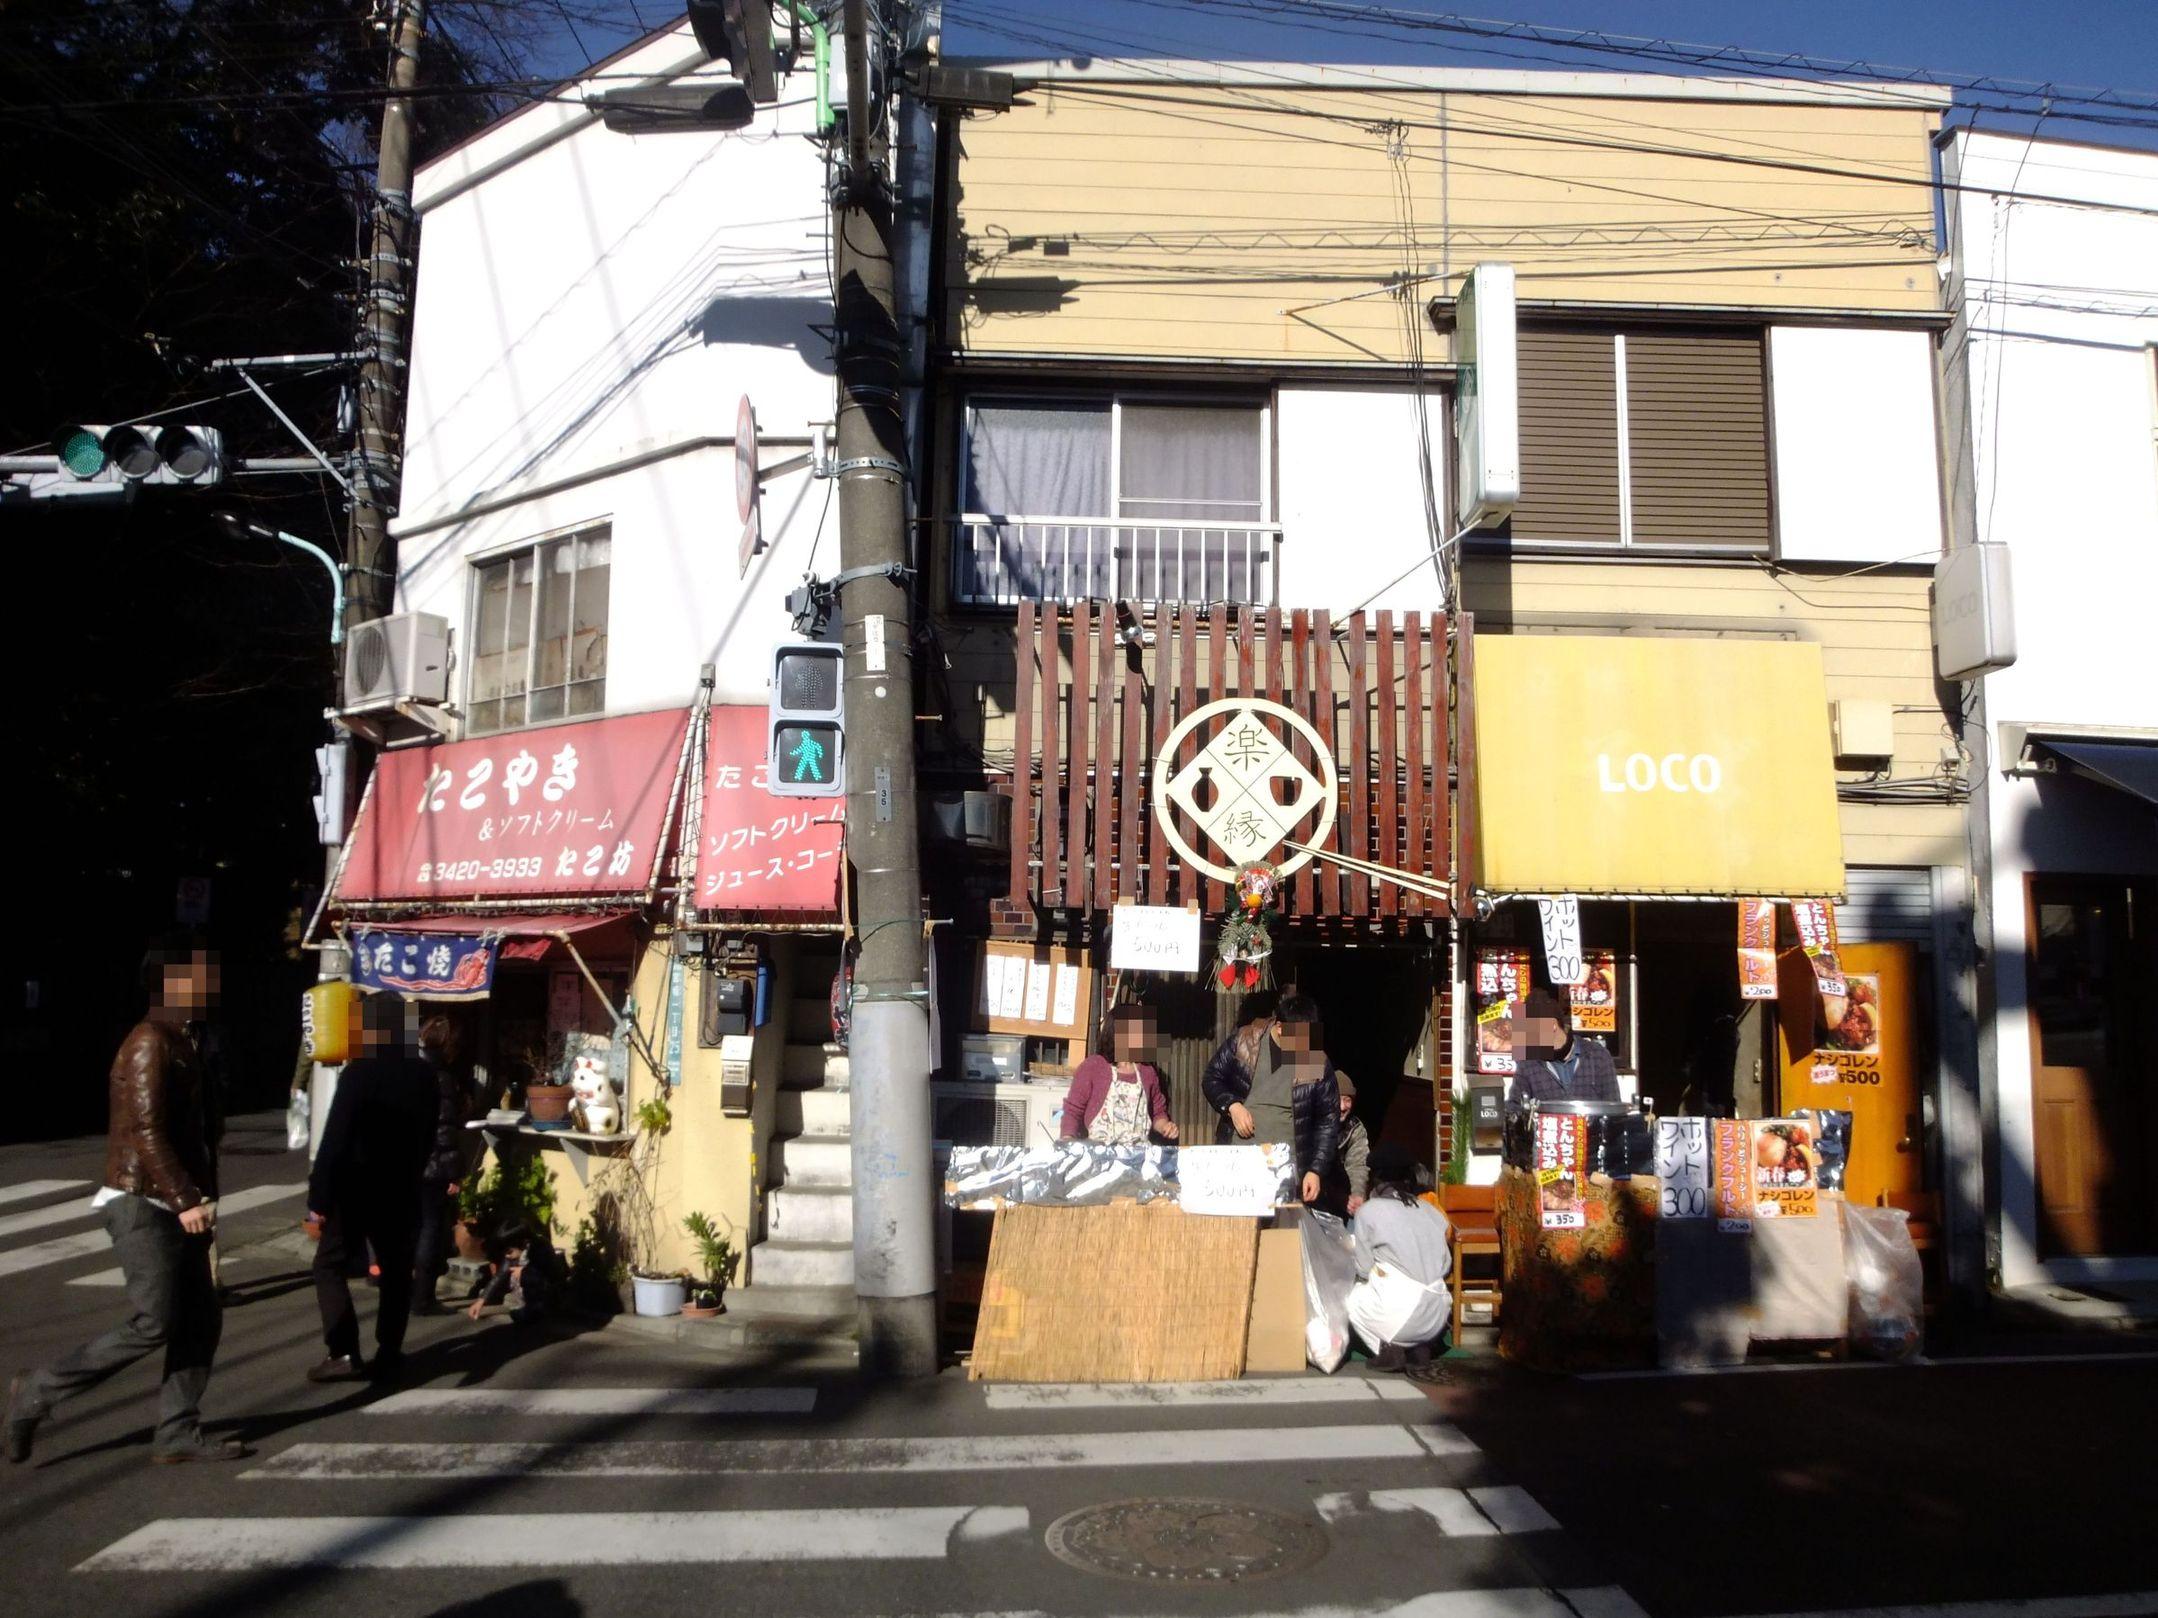 cafebar LOCO